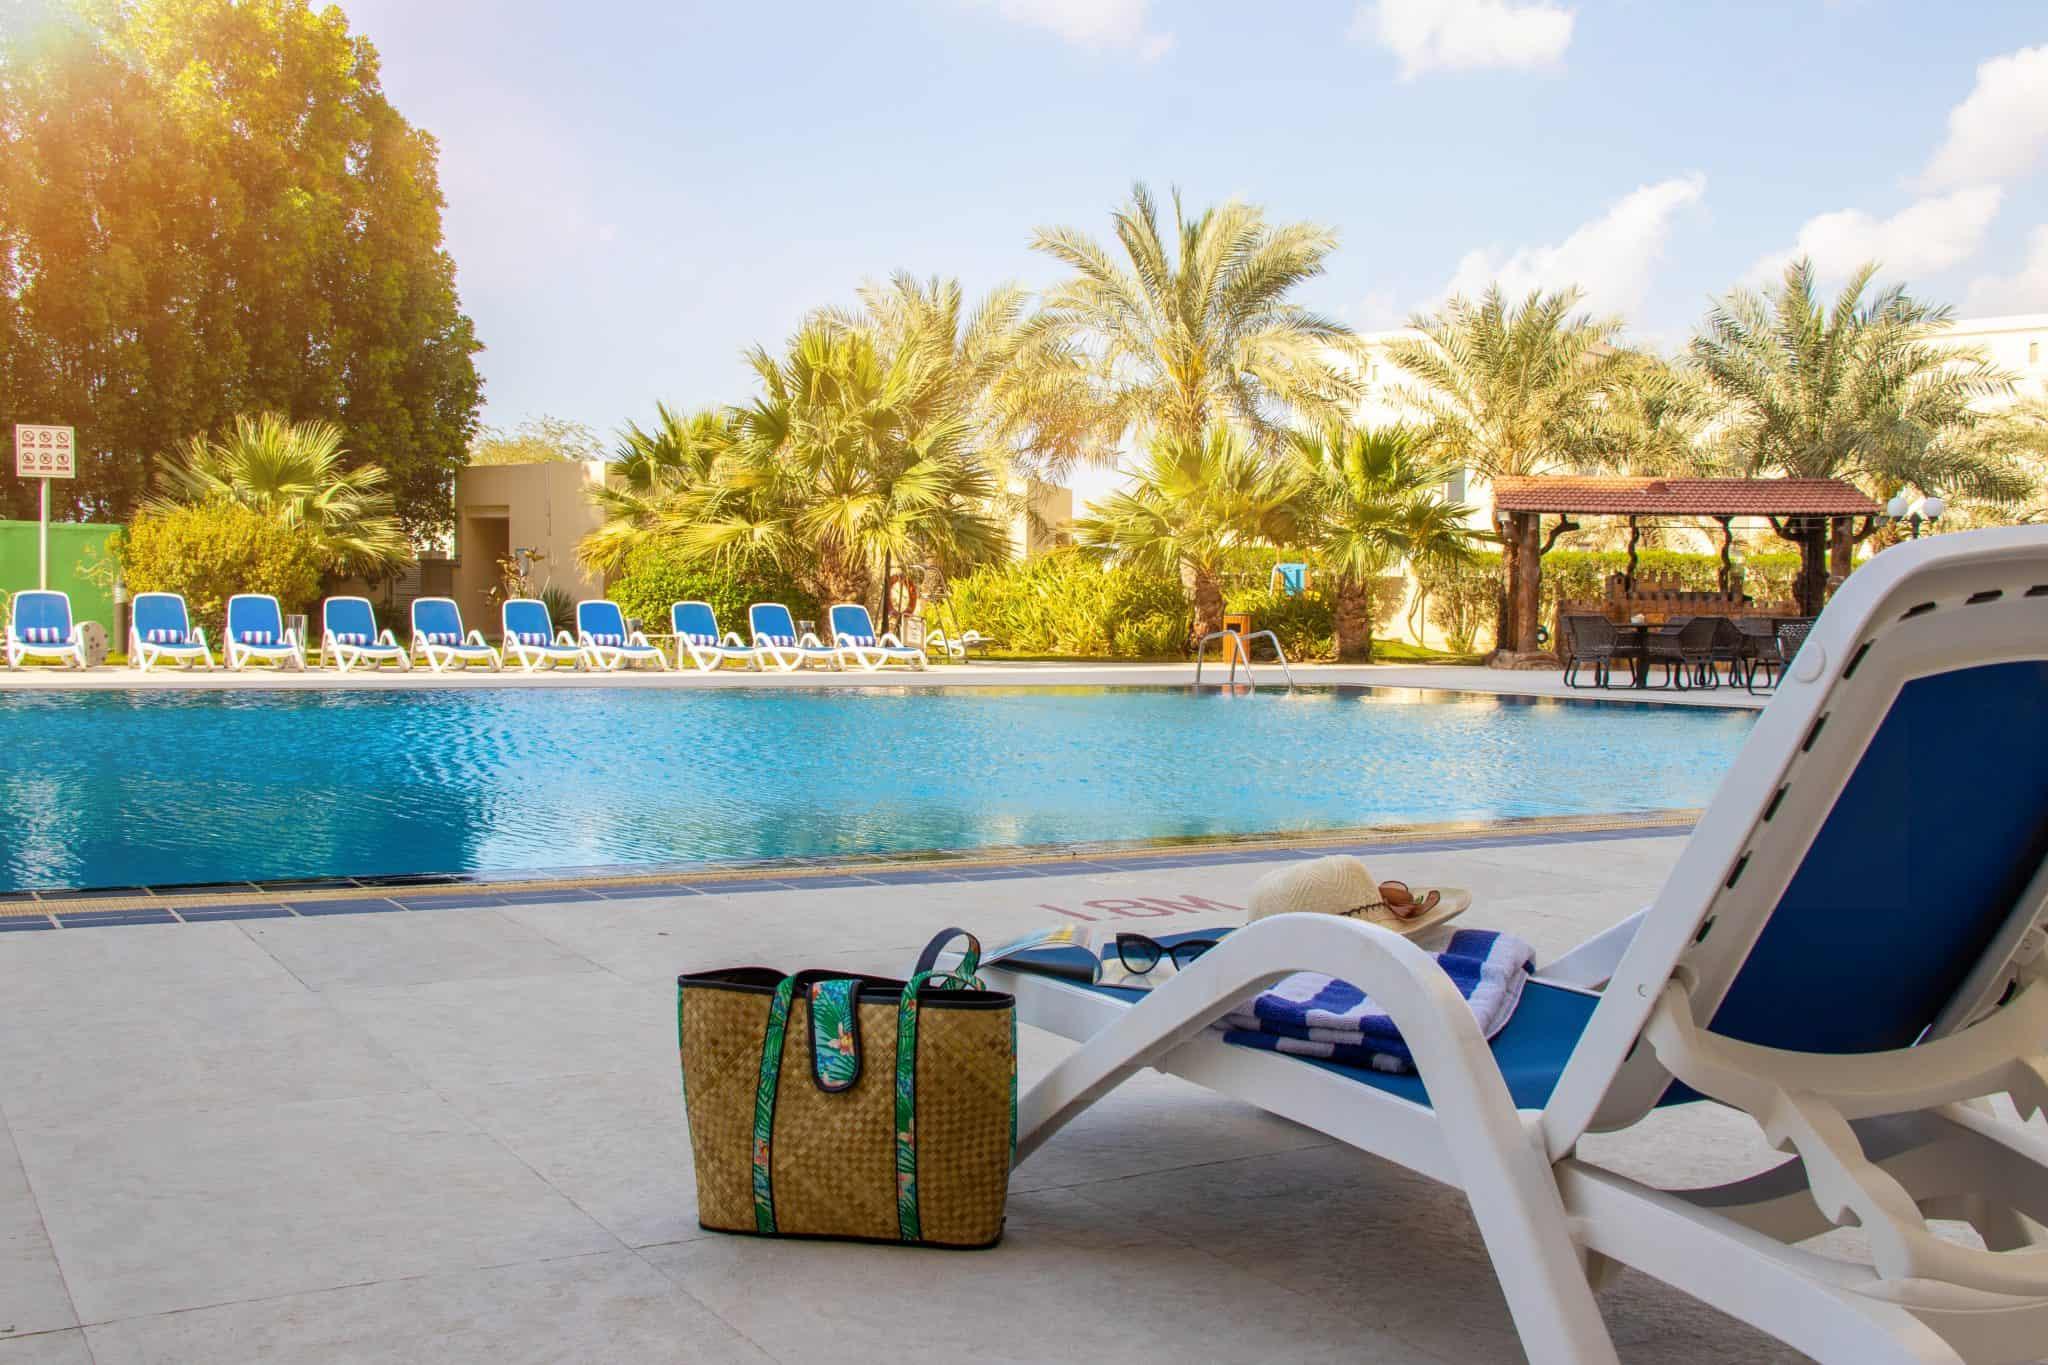 La Chaise Longue Billard friday pool brunch party at bin majid acacia hotel | wow-rak